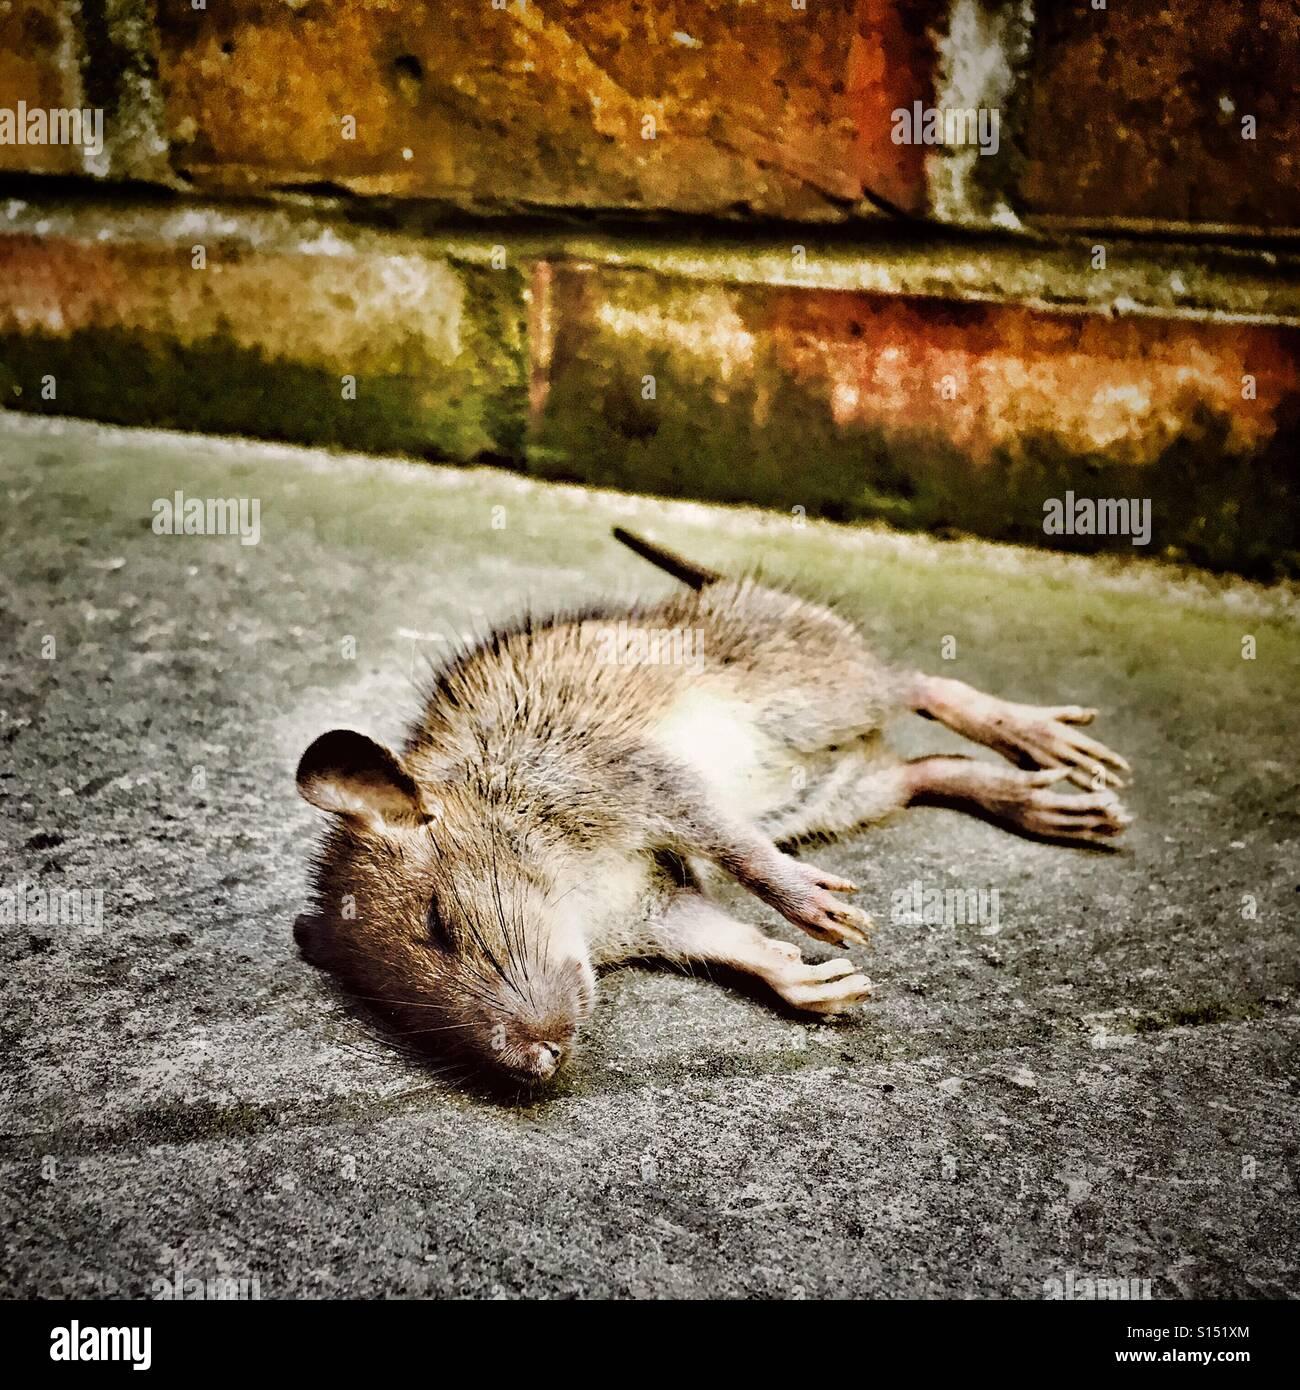 Dead rat - Stock Image